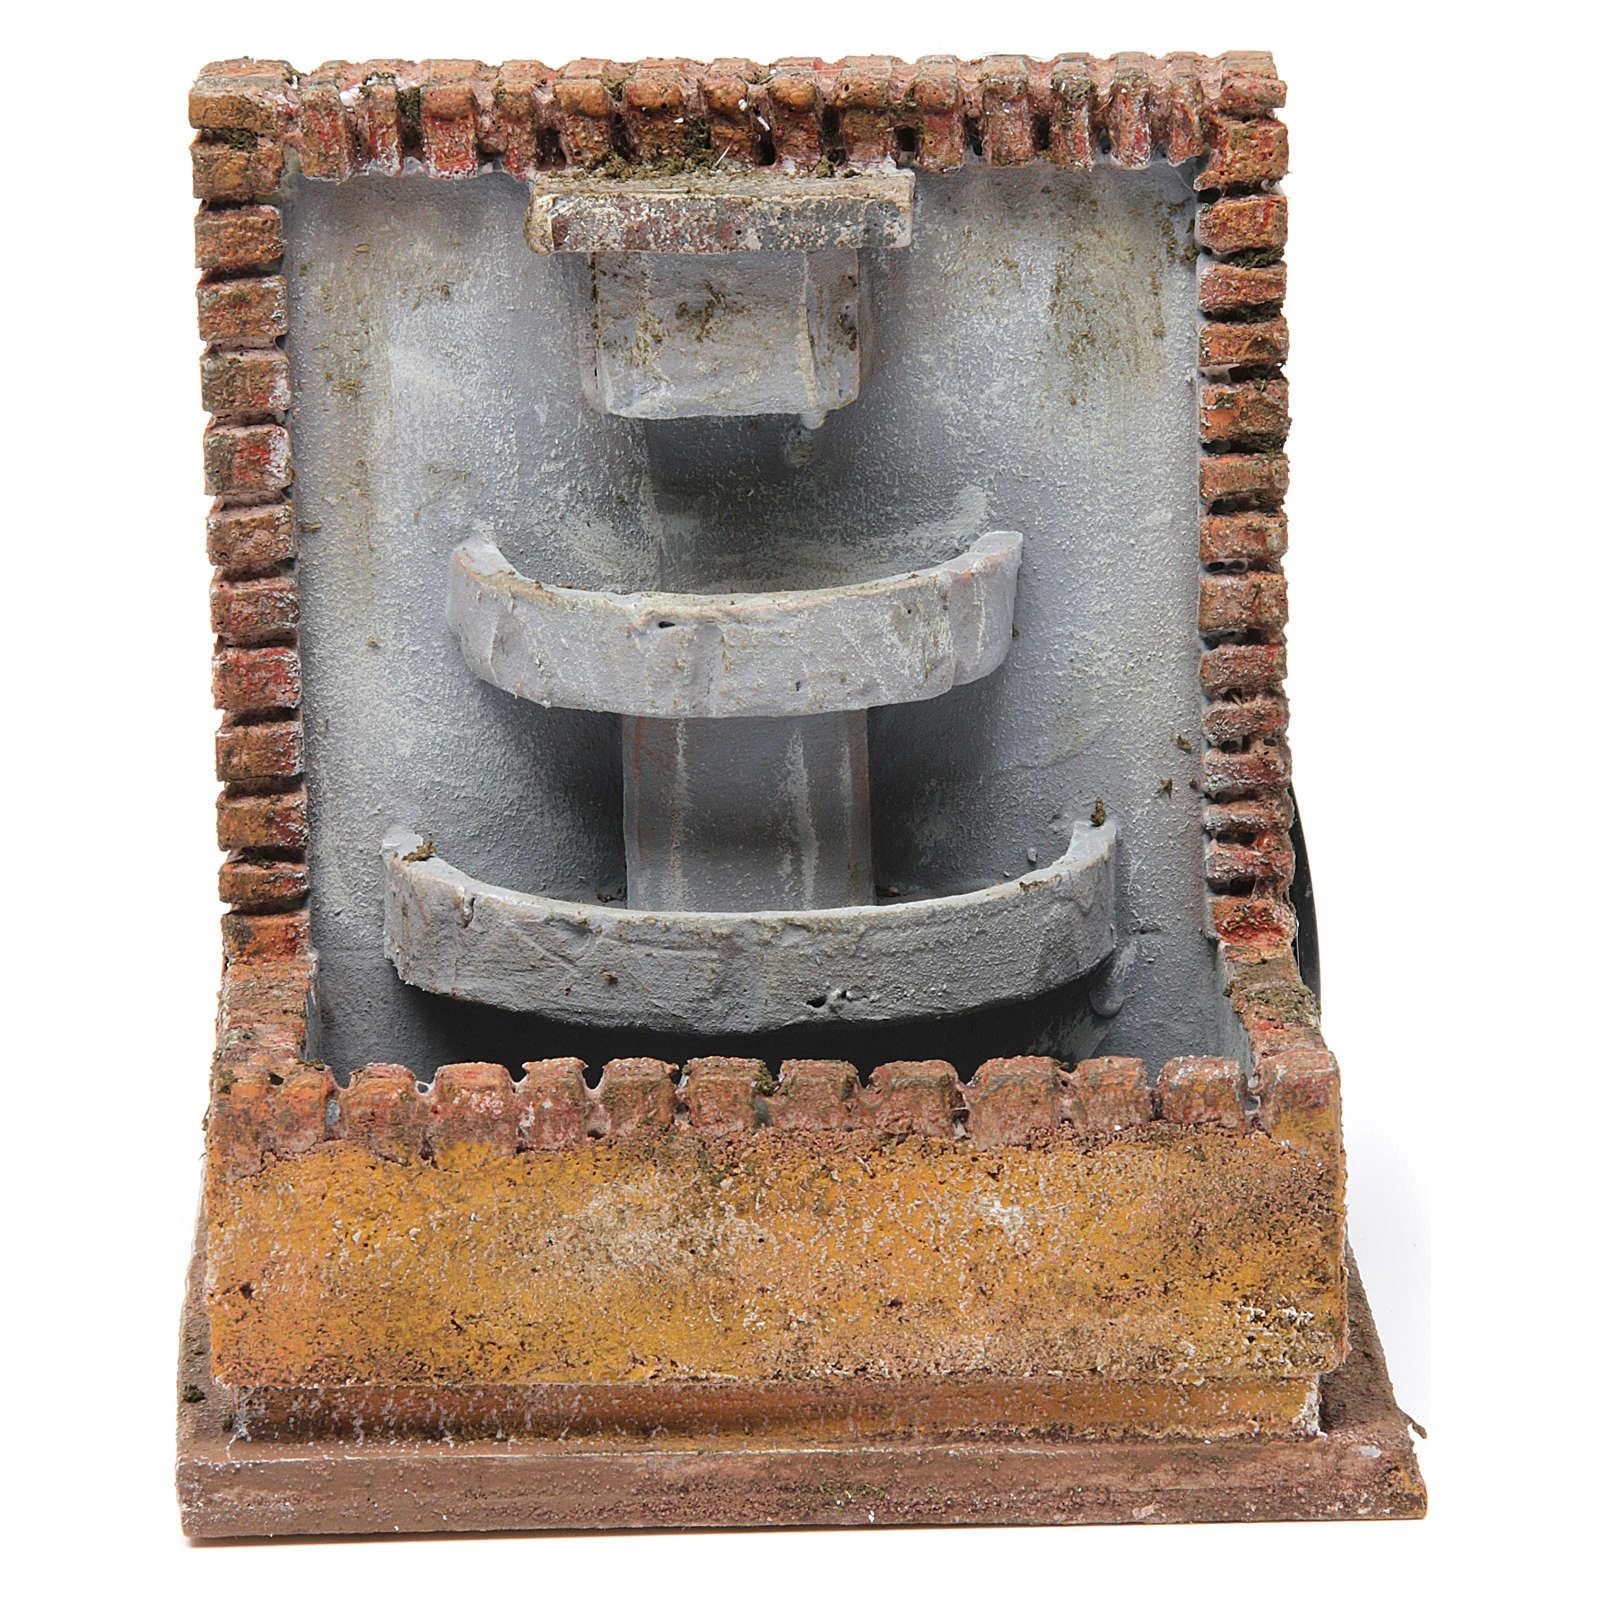 Fontana per presepe 10-12 cm 20x15x15 cm 4